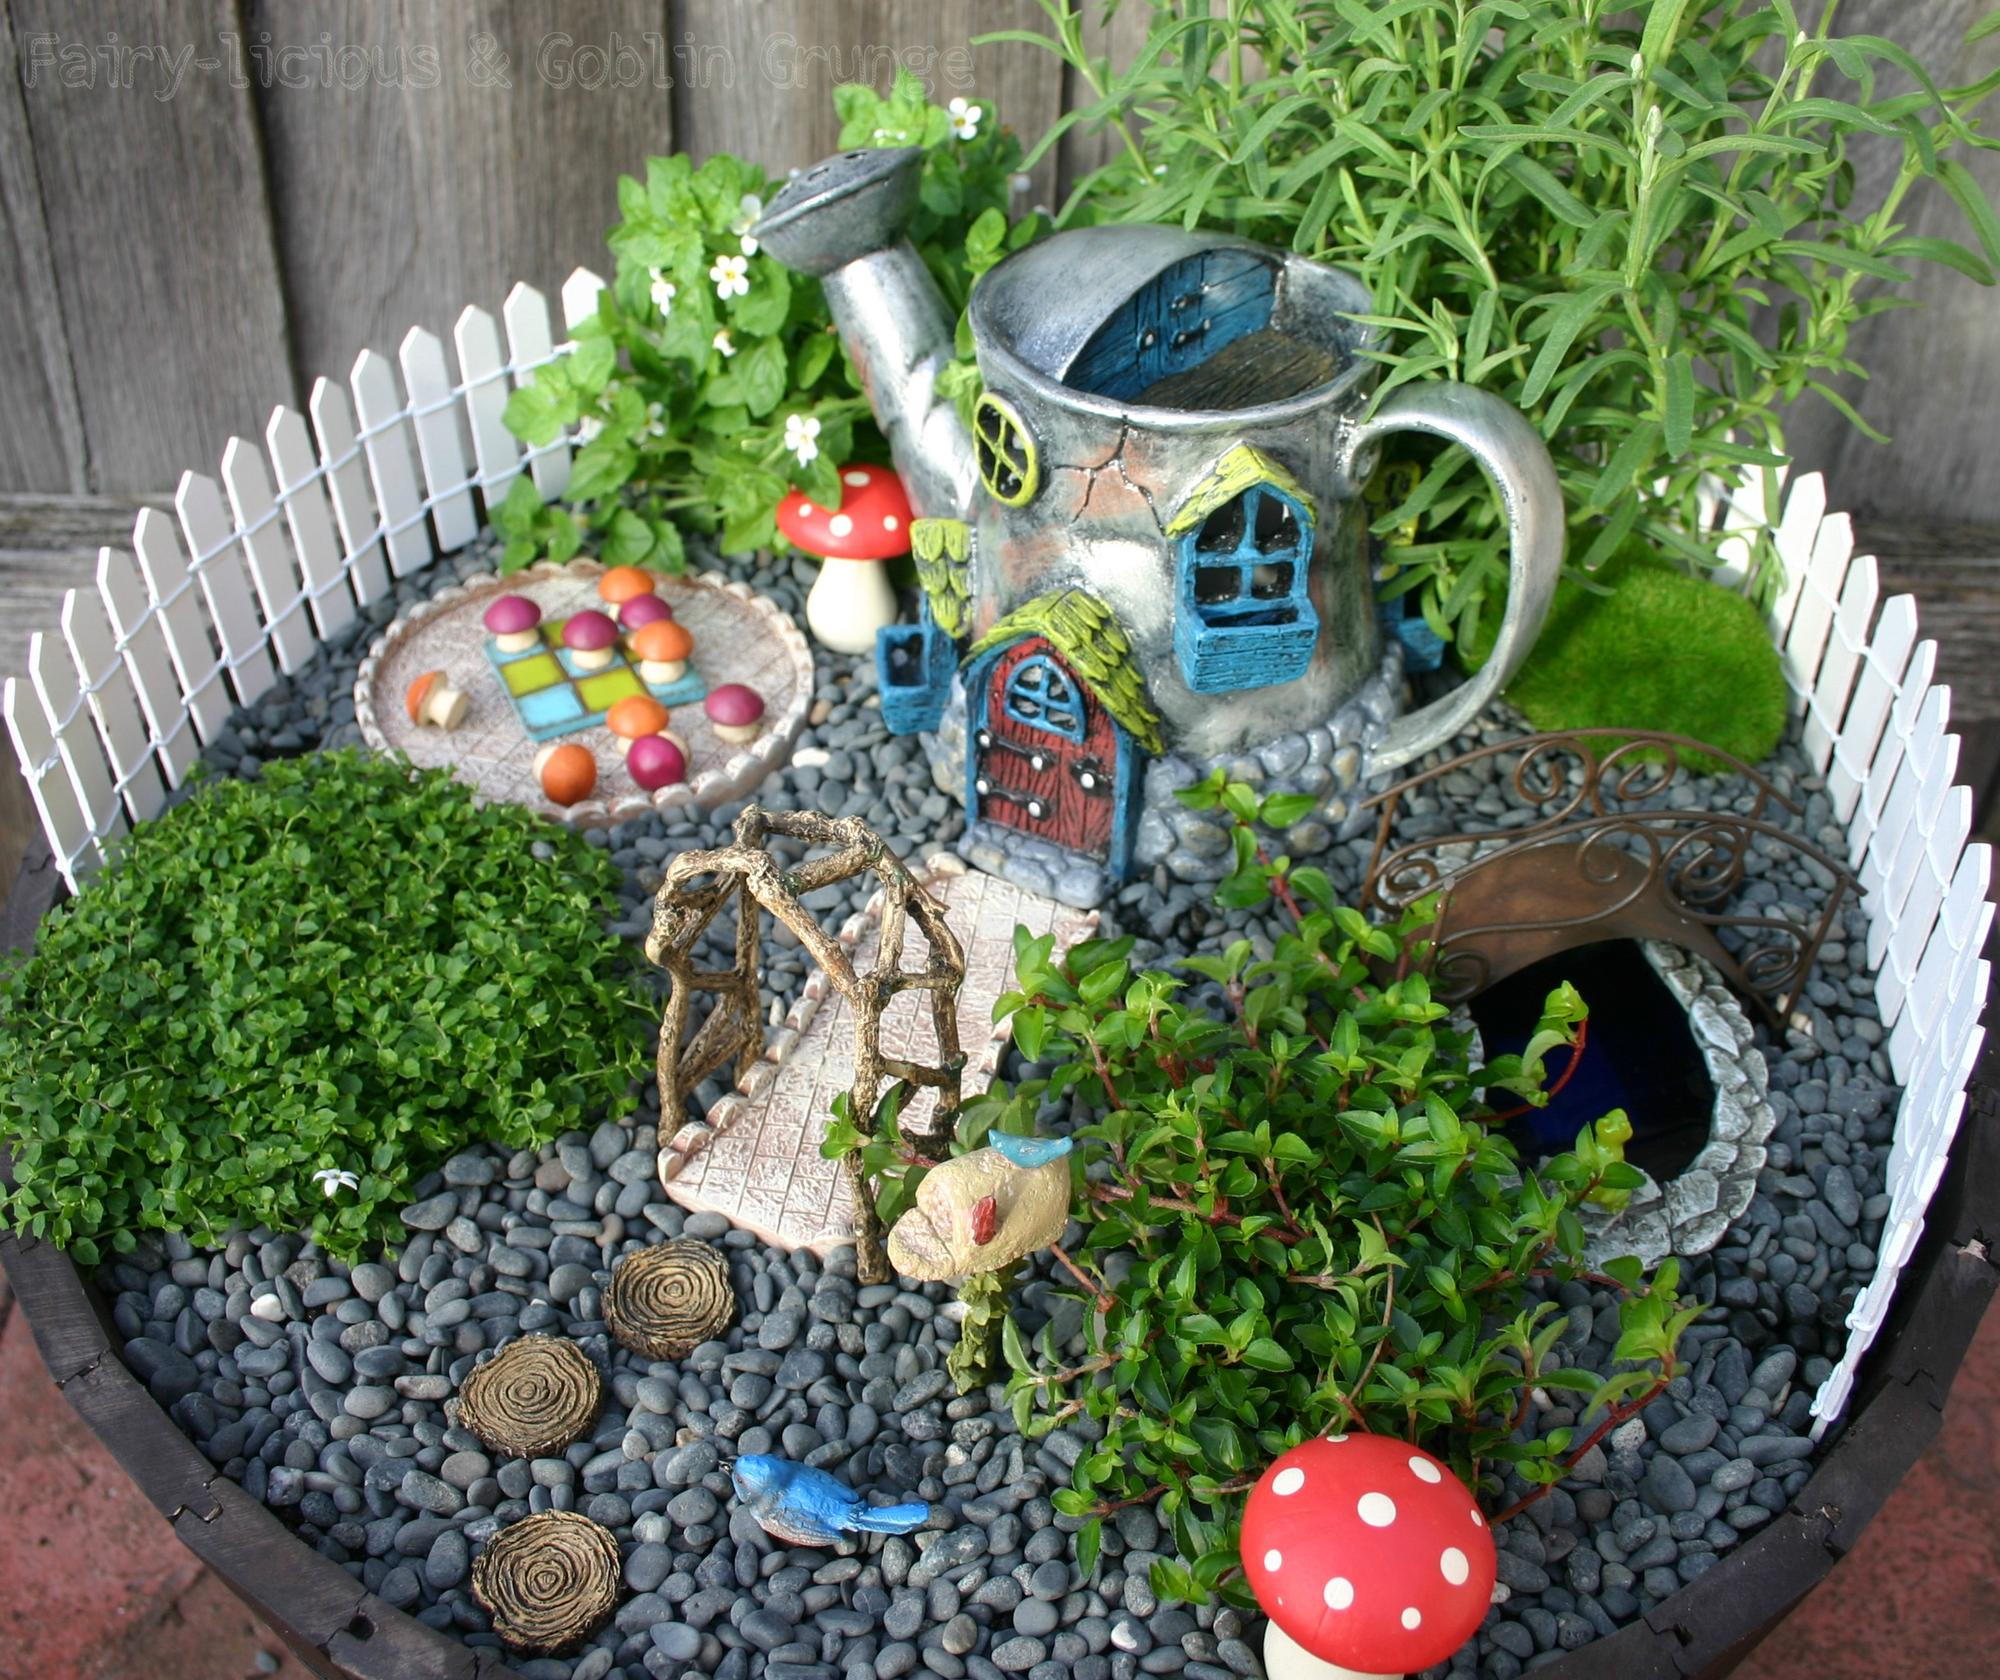 26 Mini Indoor Garden Ideas To Green Your Home: KIDS WORKSHOP: FAIRY GARDEN WORKSHOP FOR KIDS Tickets In